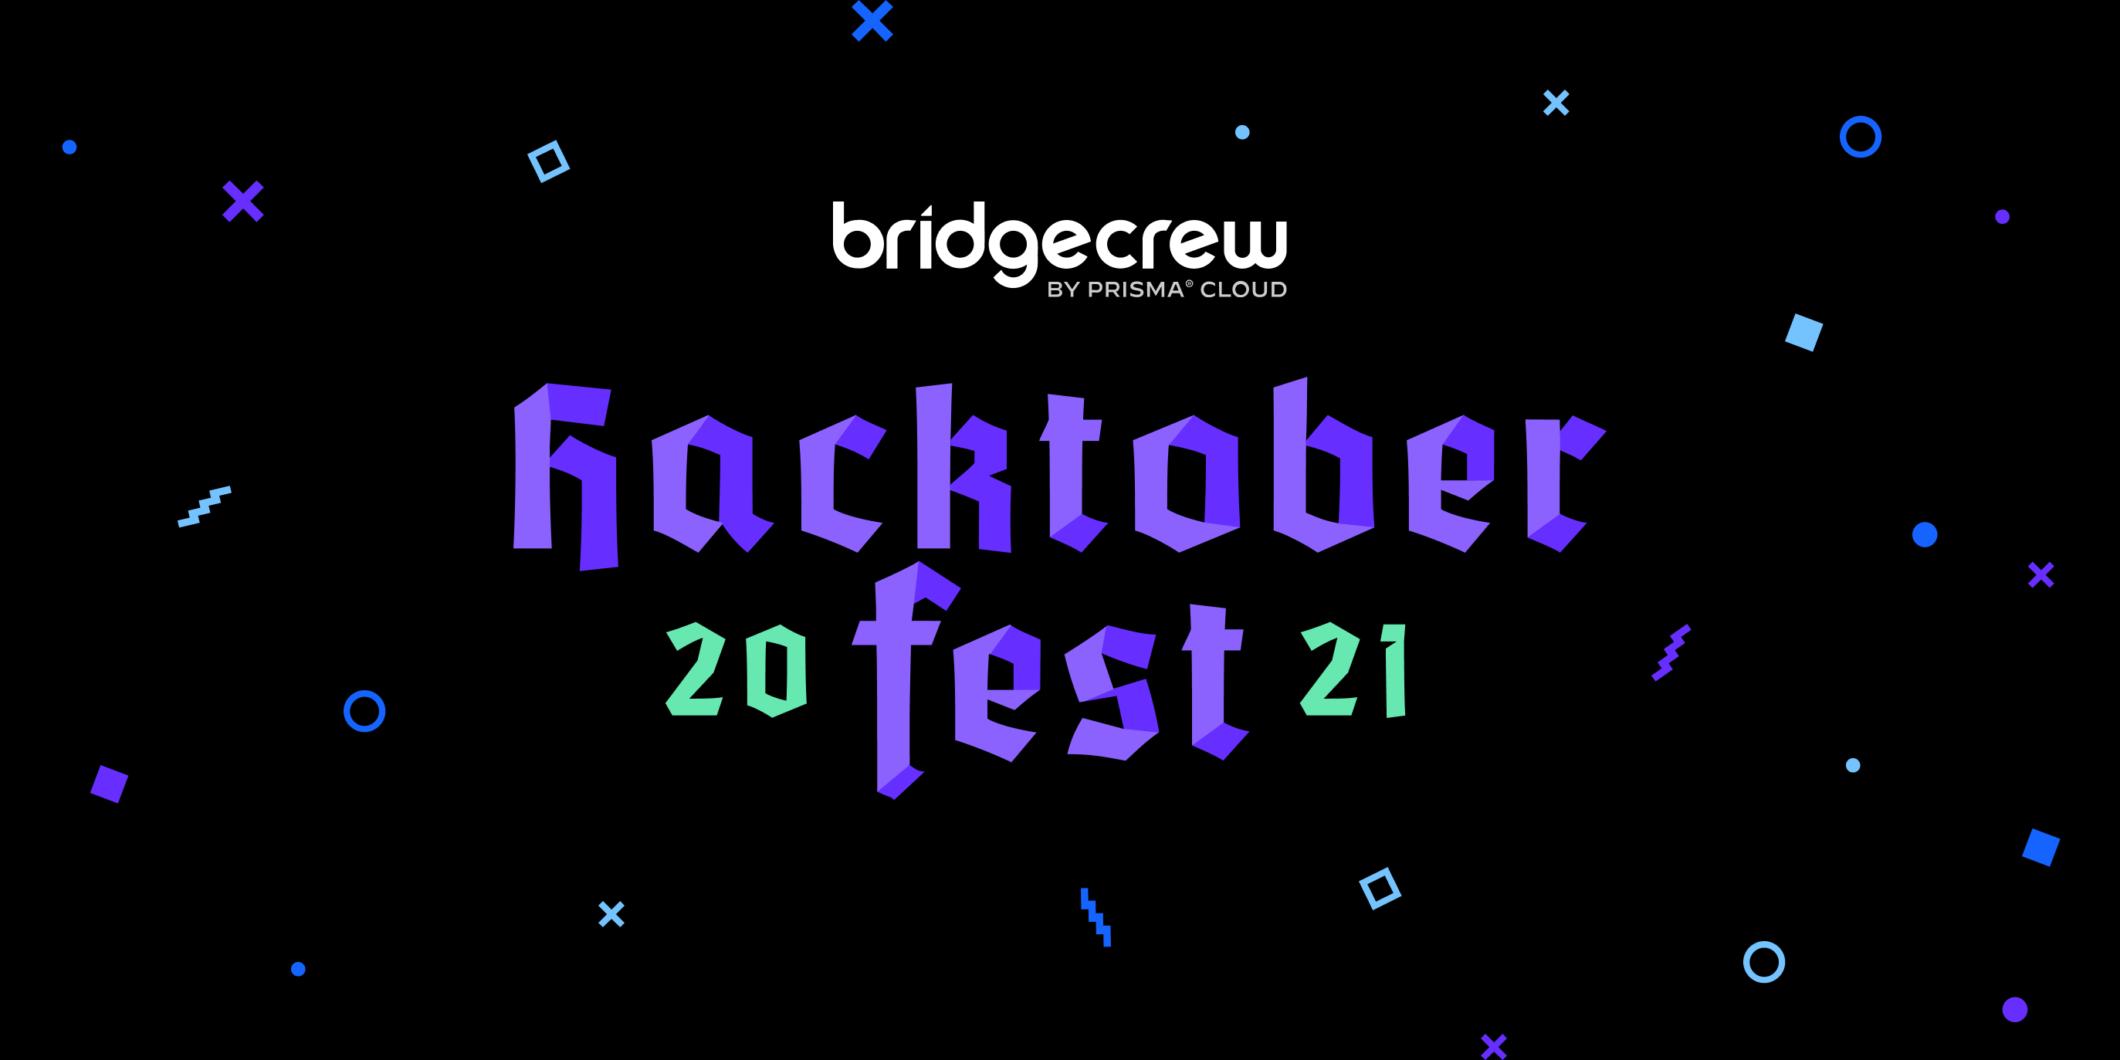 hacktoberfest giveaway image